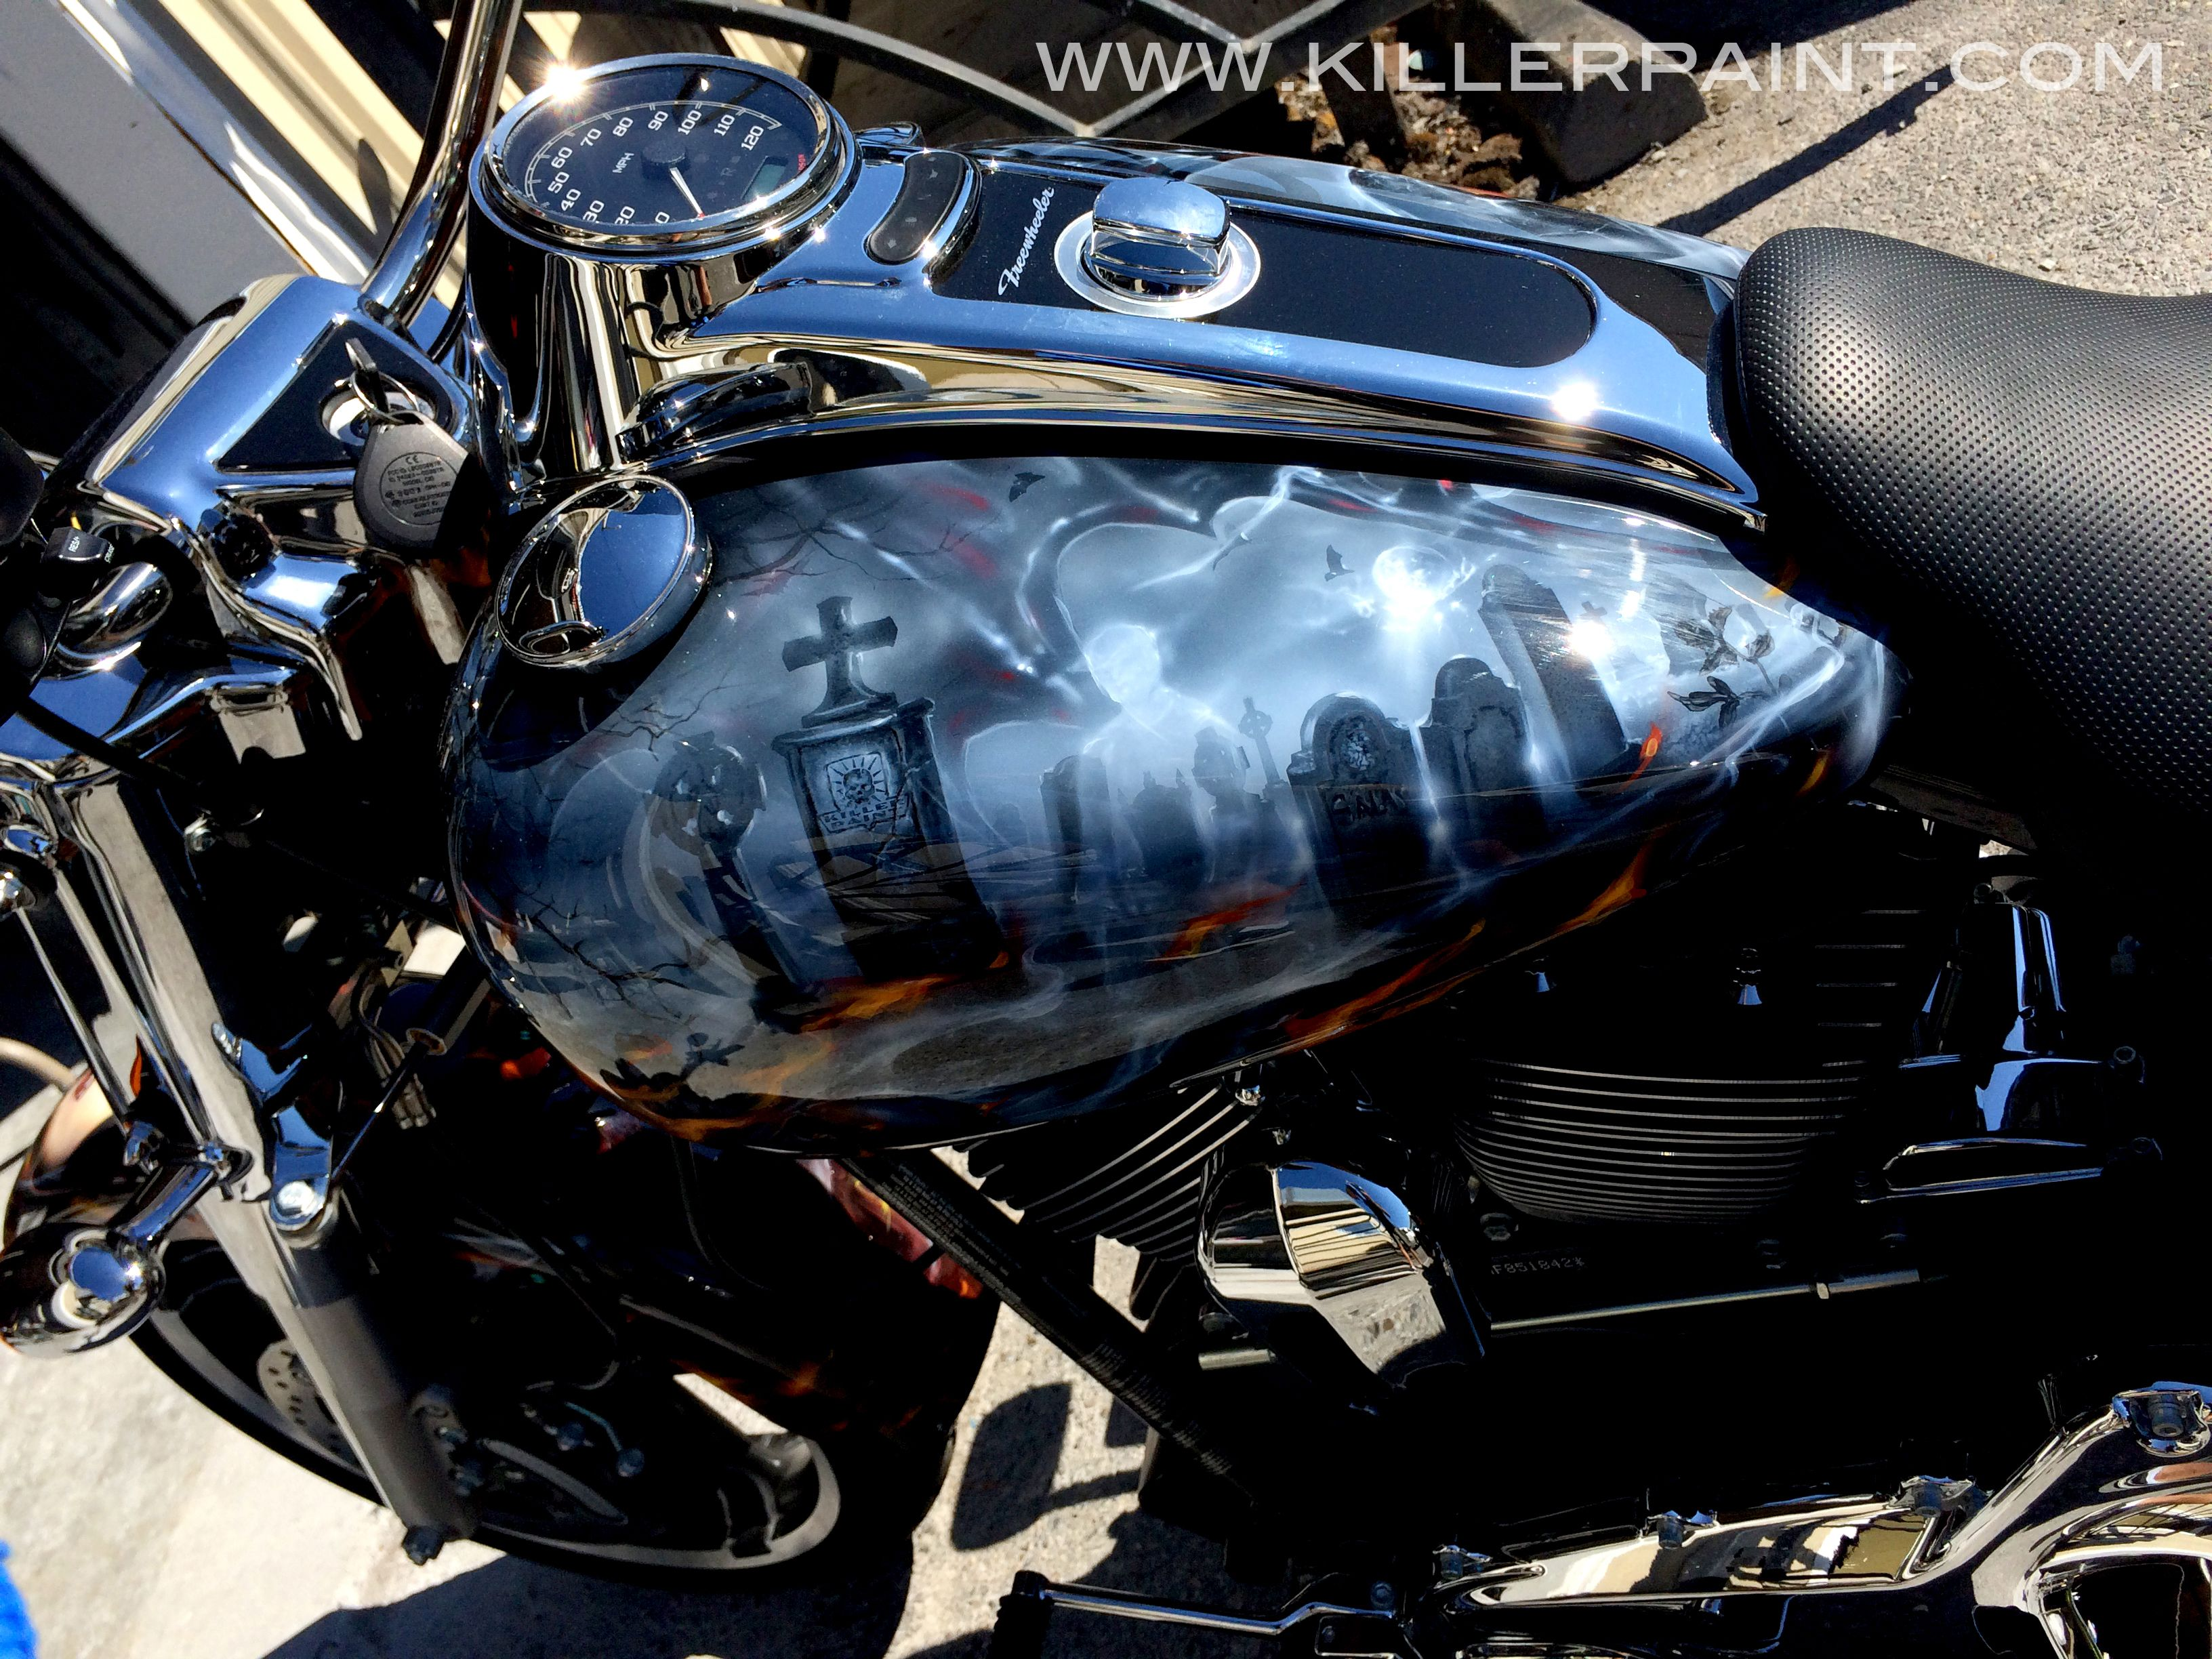 Freewheelin Vampires Bikes Motorcycle Art